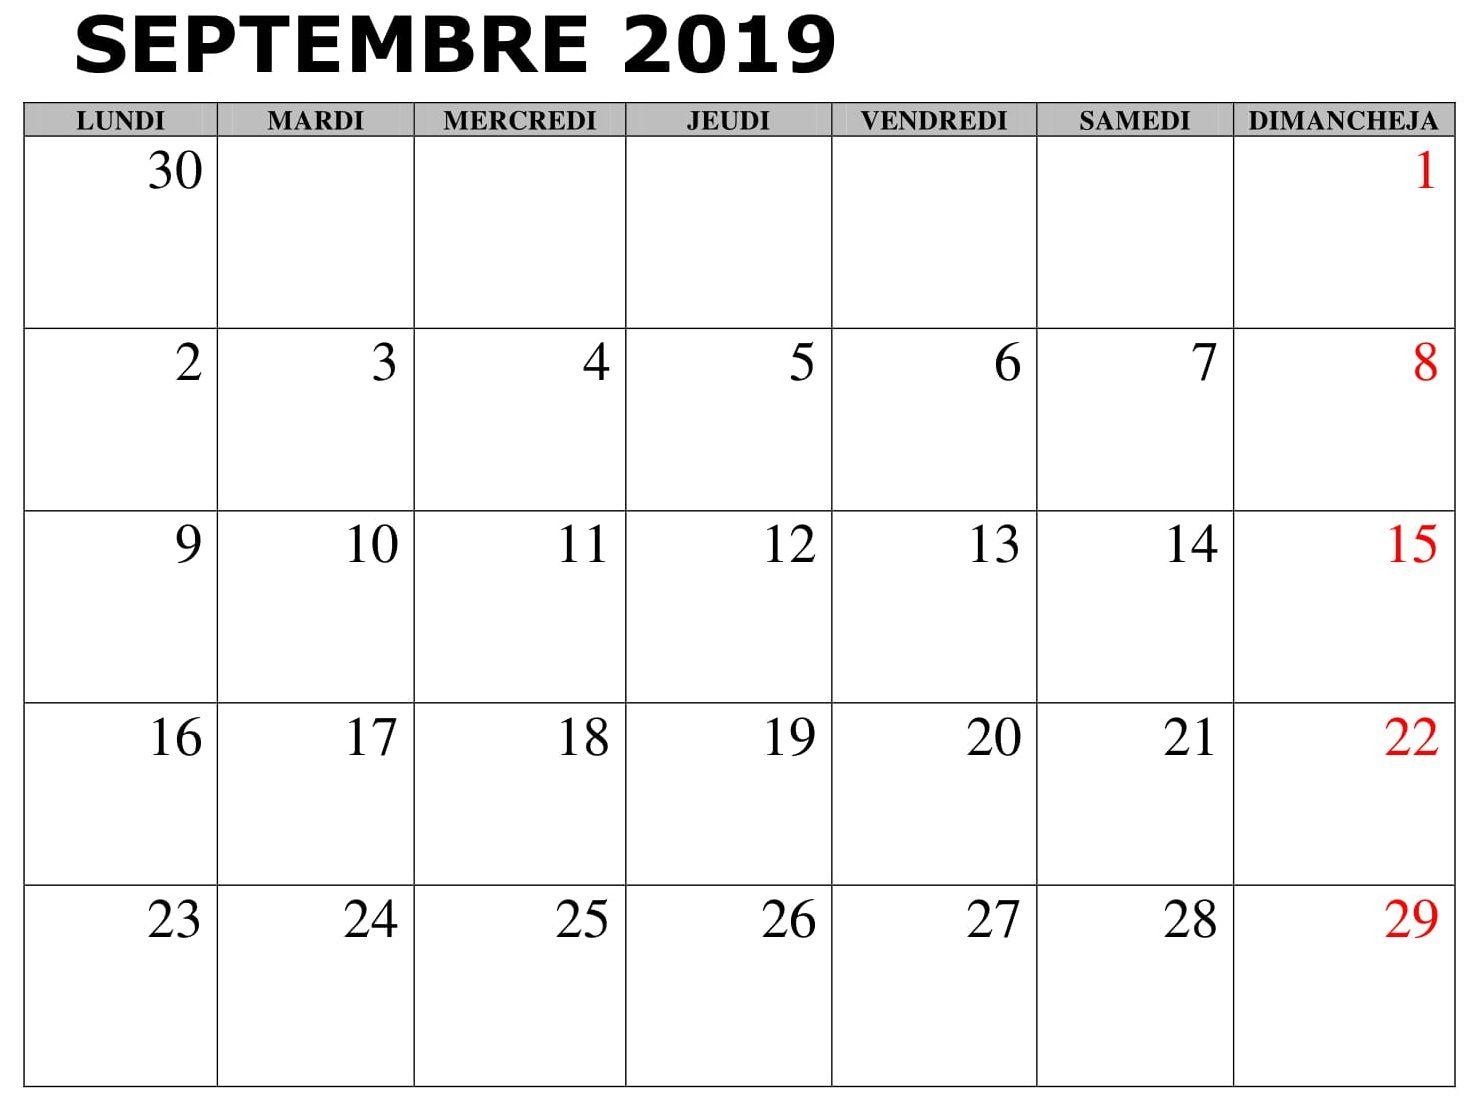 Template Calendrier 2019.Calendrier Septembre 2019 Word Blank Calendar Template